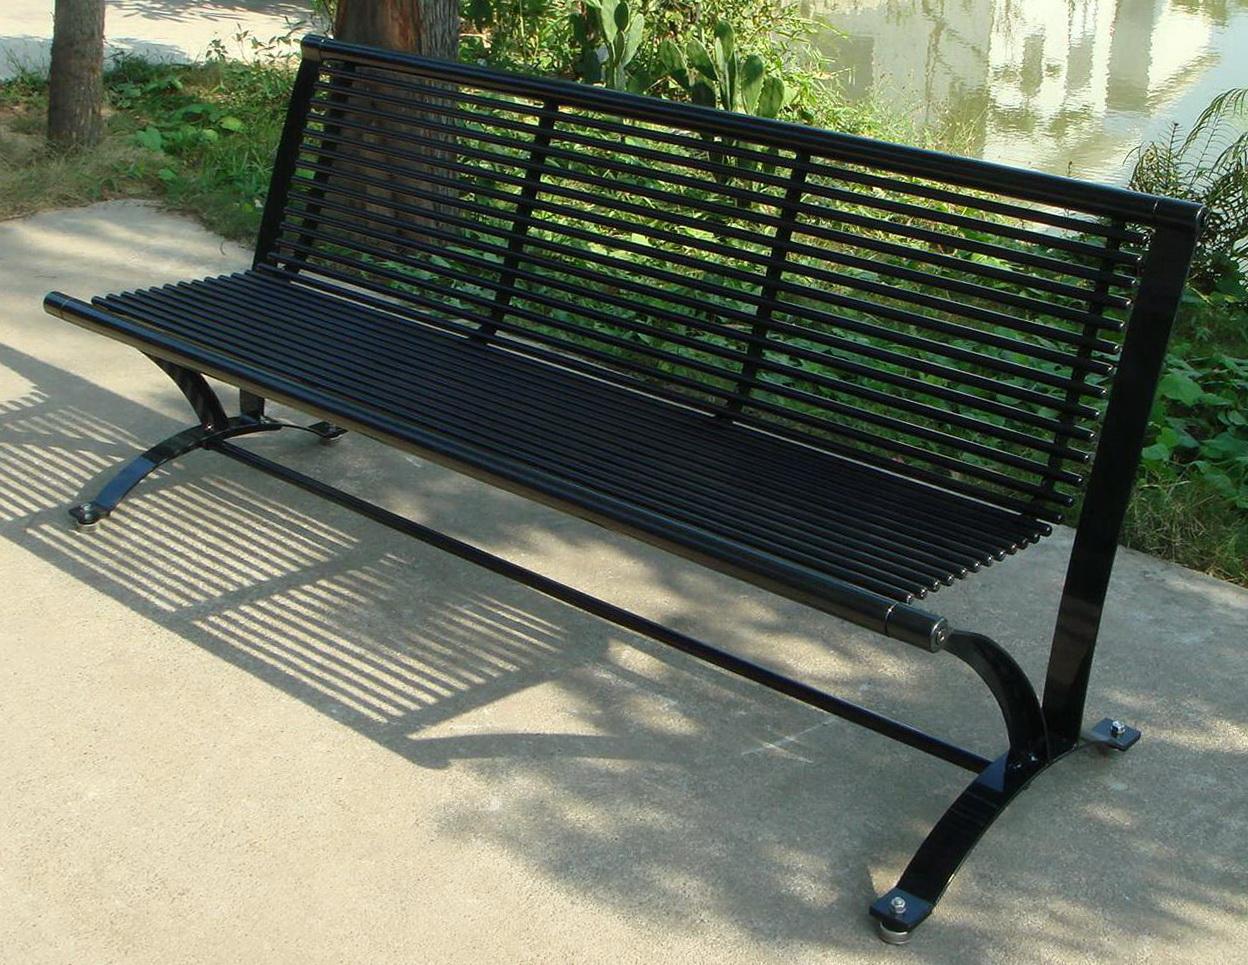 metal garden benches for sale home design ideas. Black Bedroom Furniture Sets. Home Design Ideas